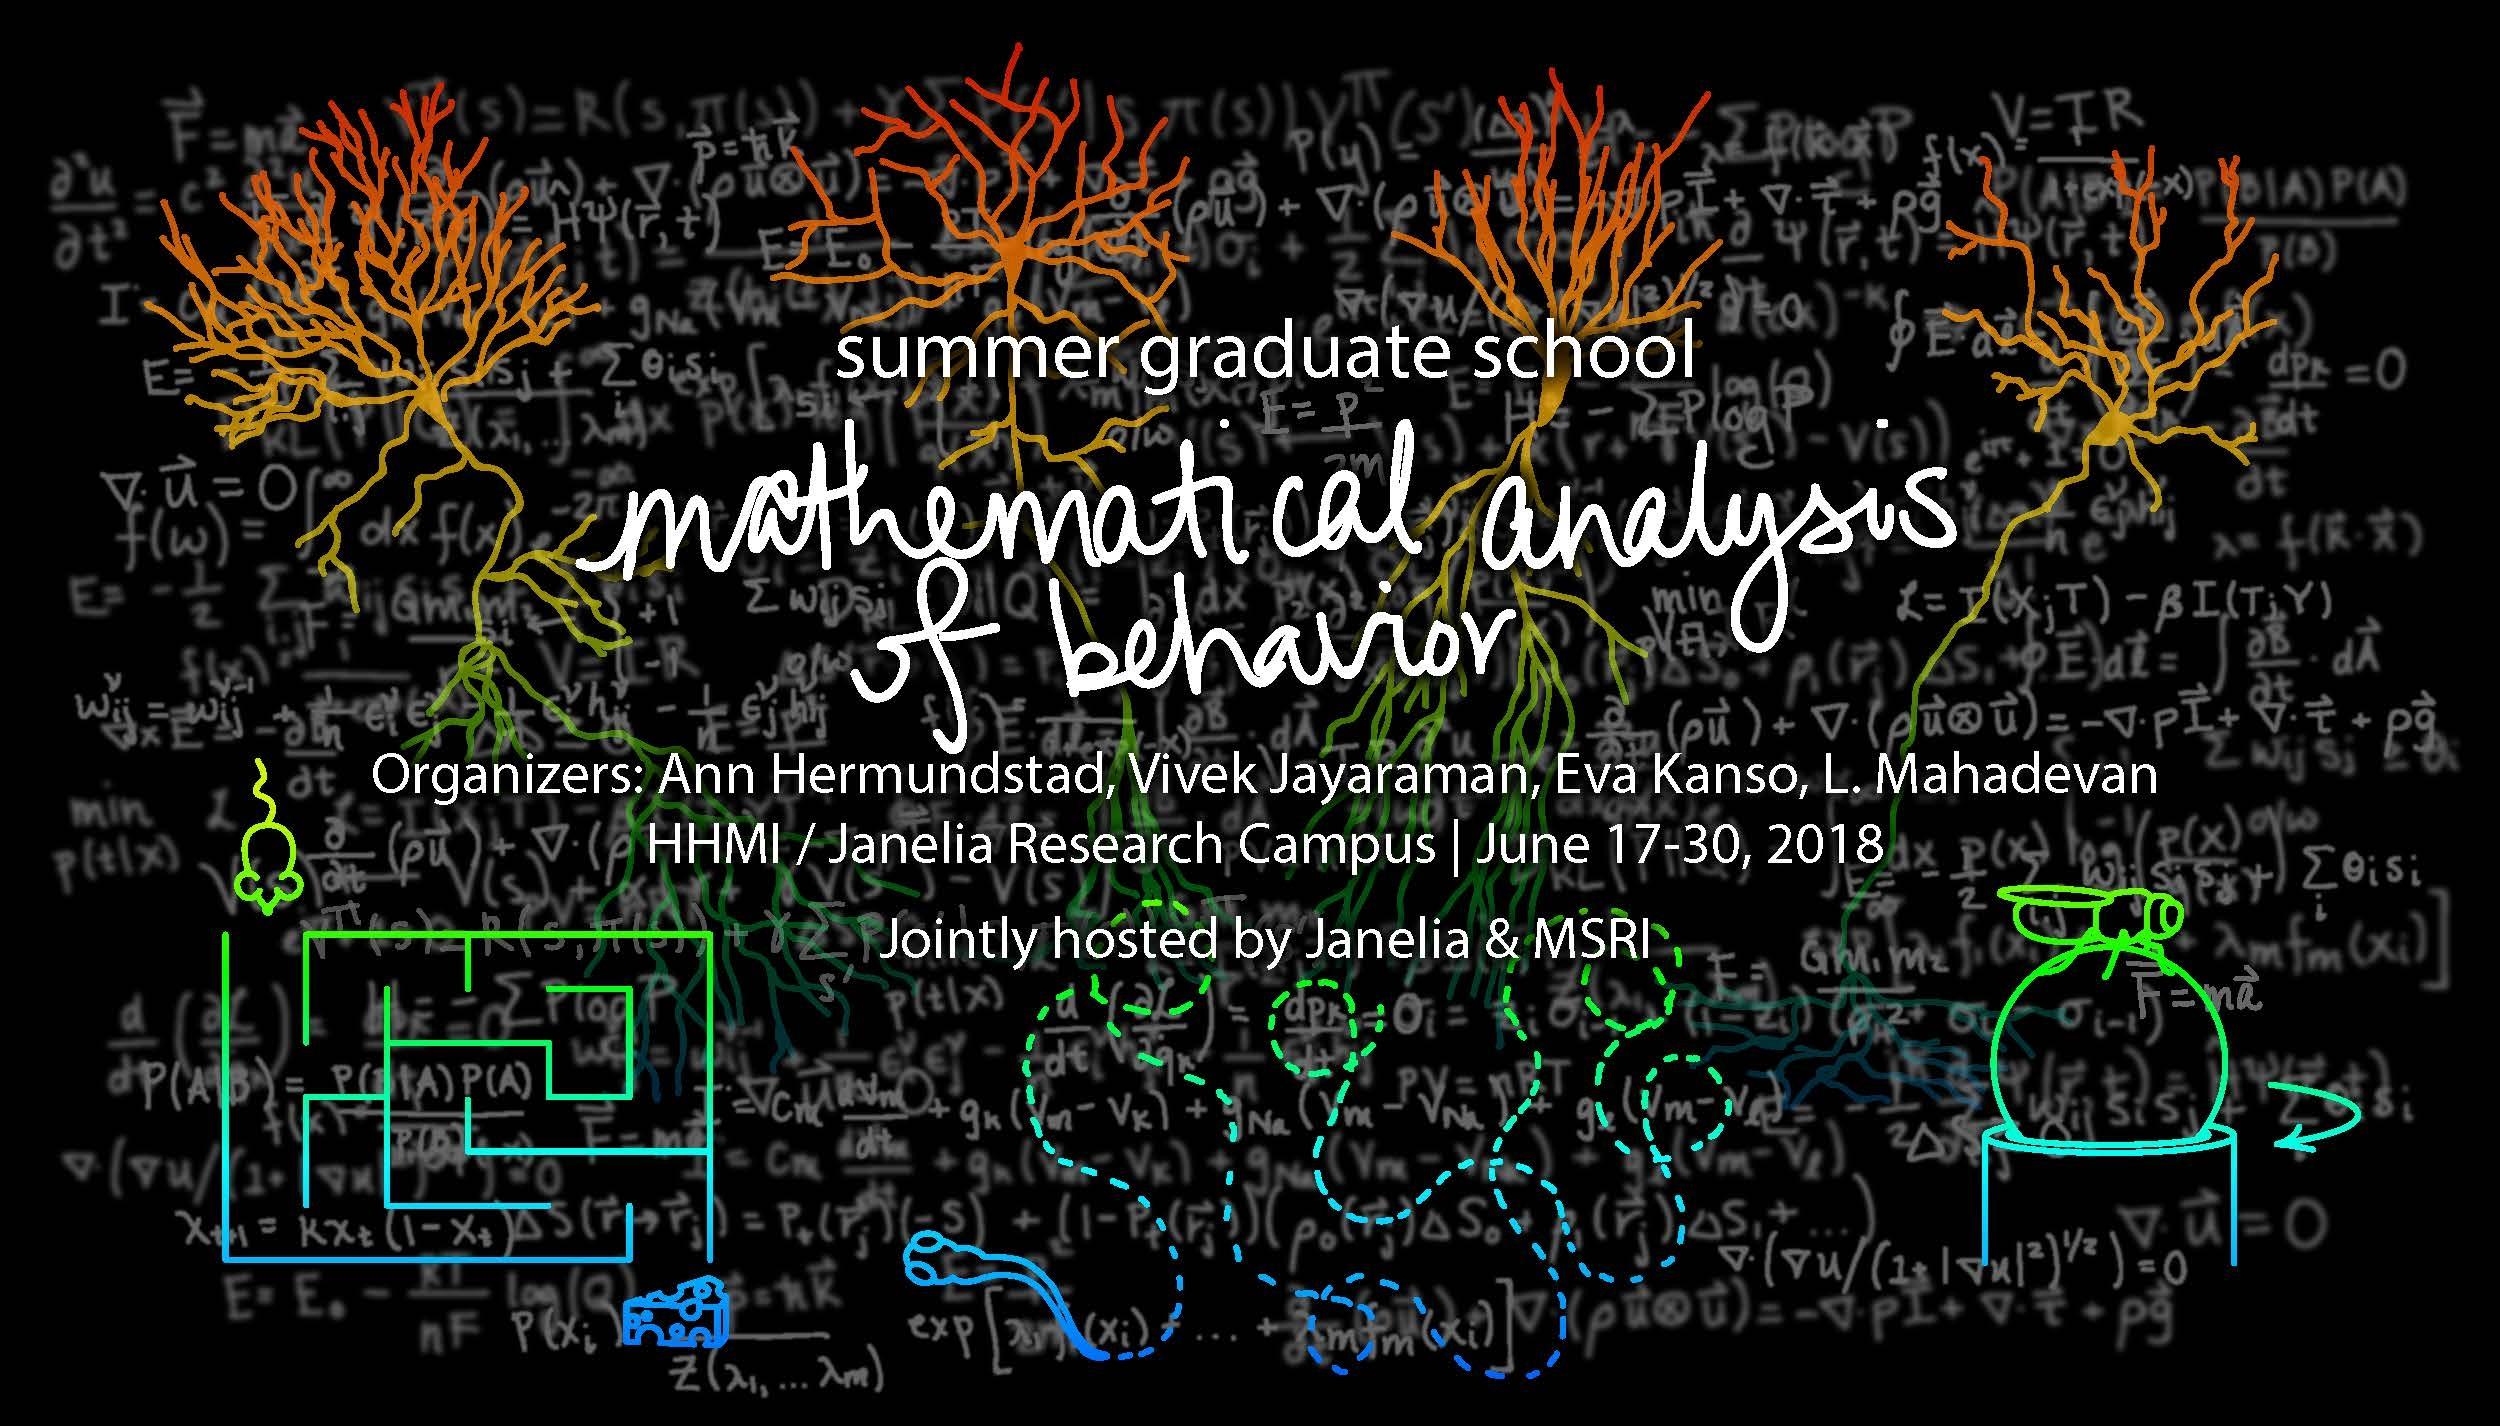 Summer Graduate School on Mathematical Analysis of Behavior ...